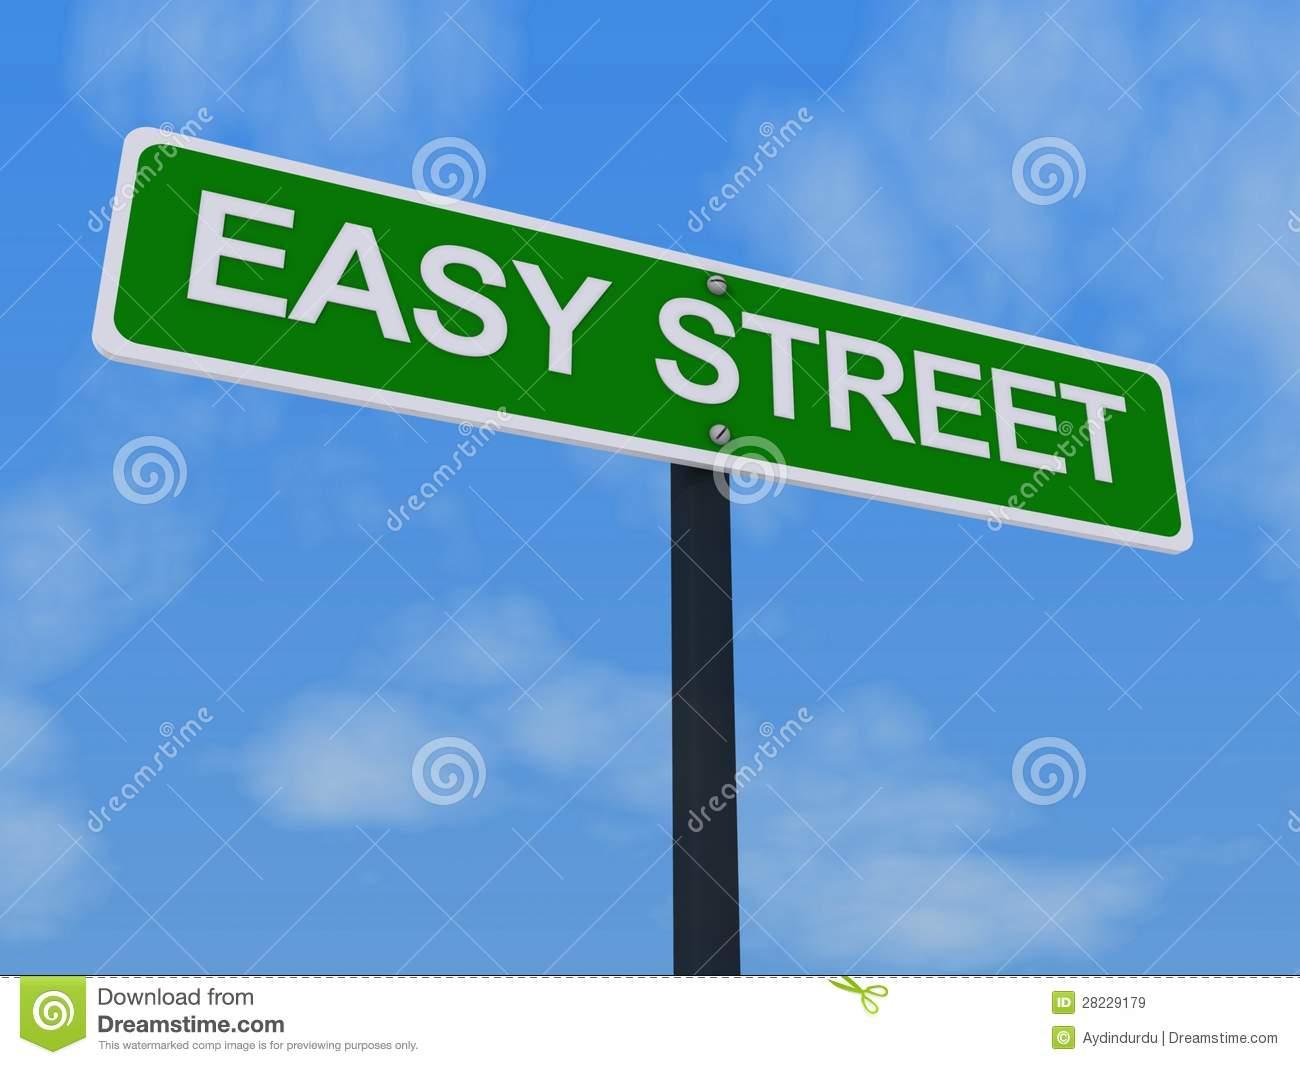 Señal de tráfico de Easy Street